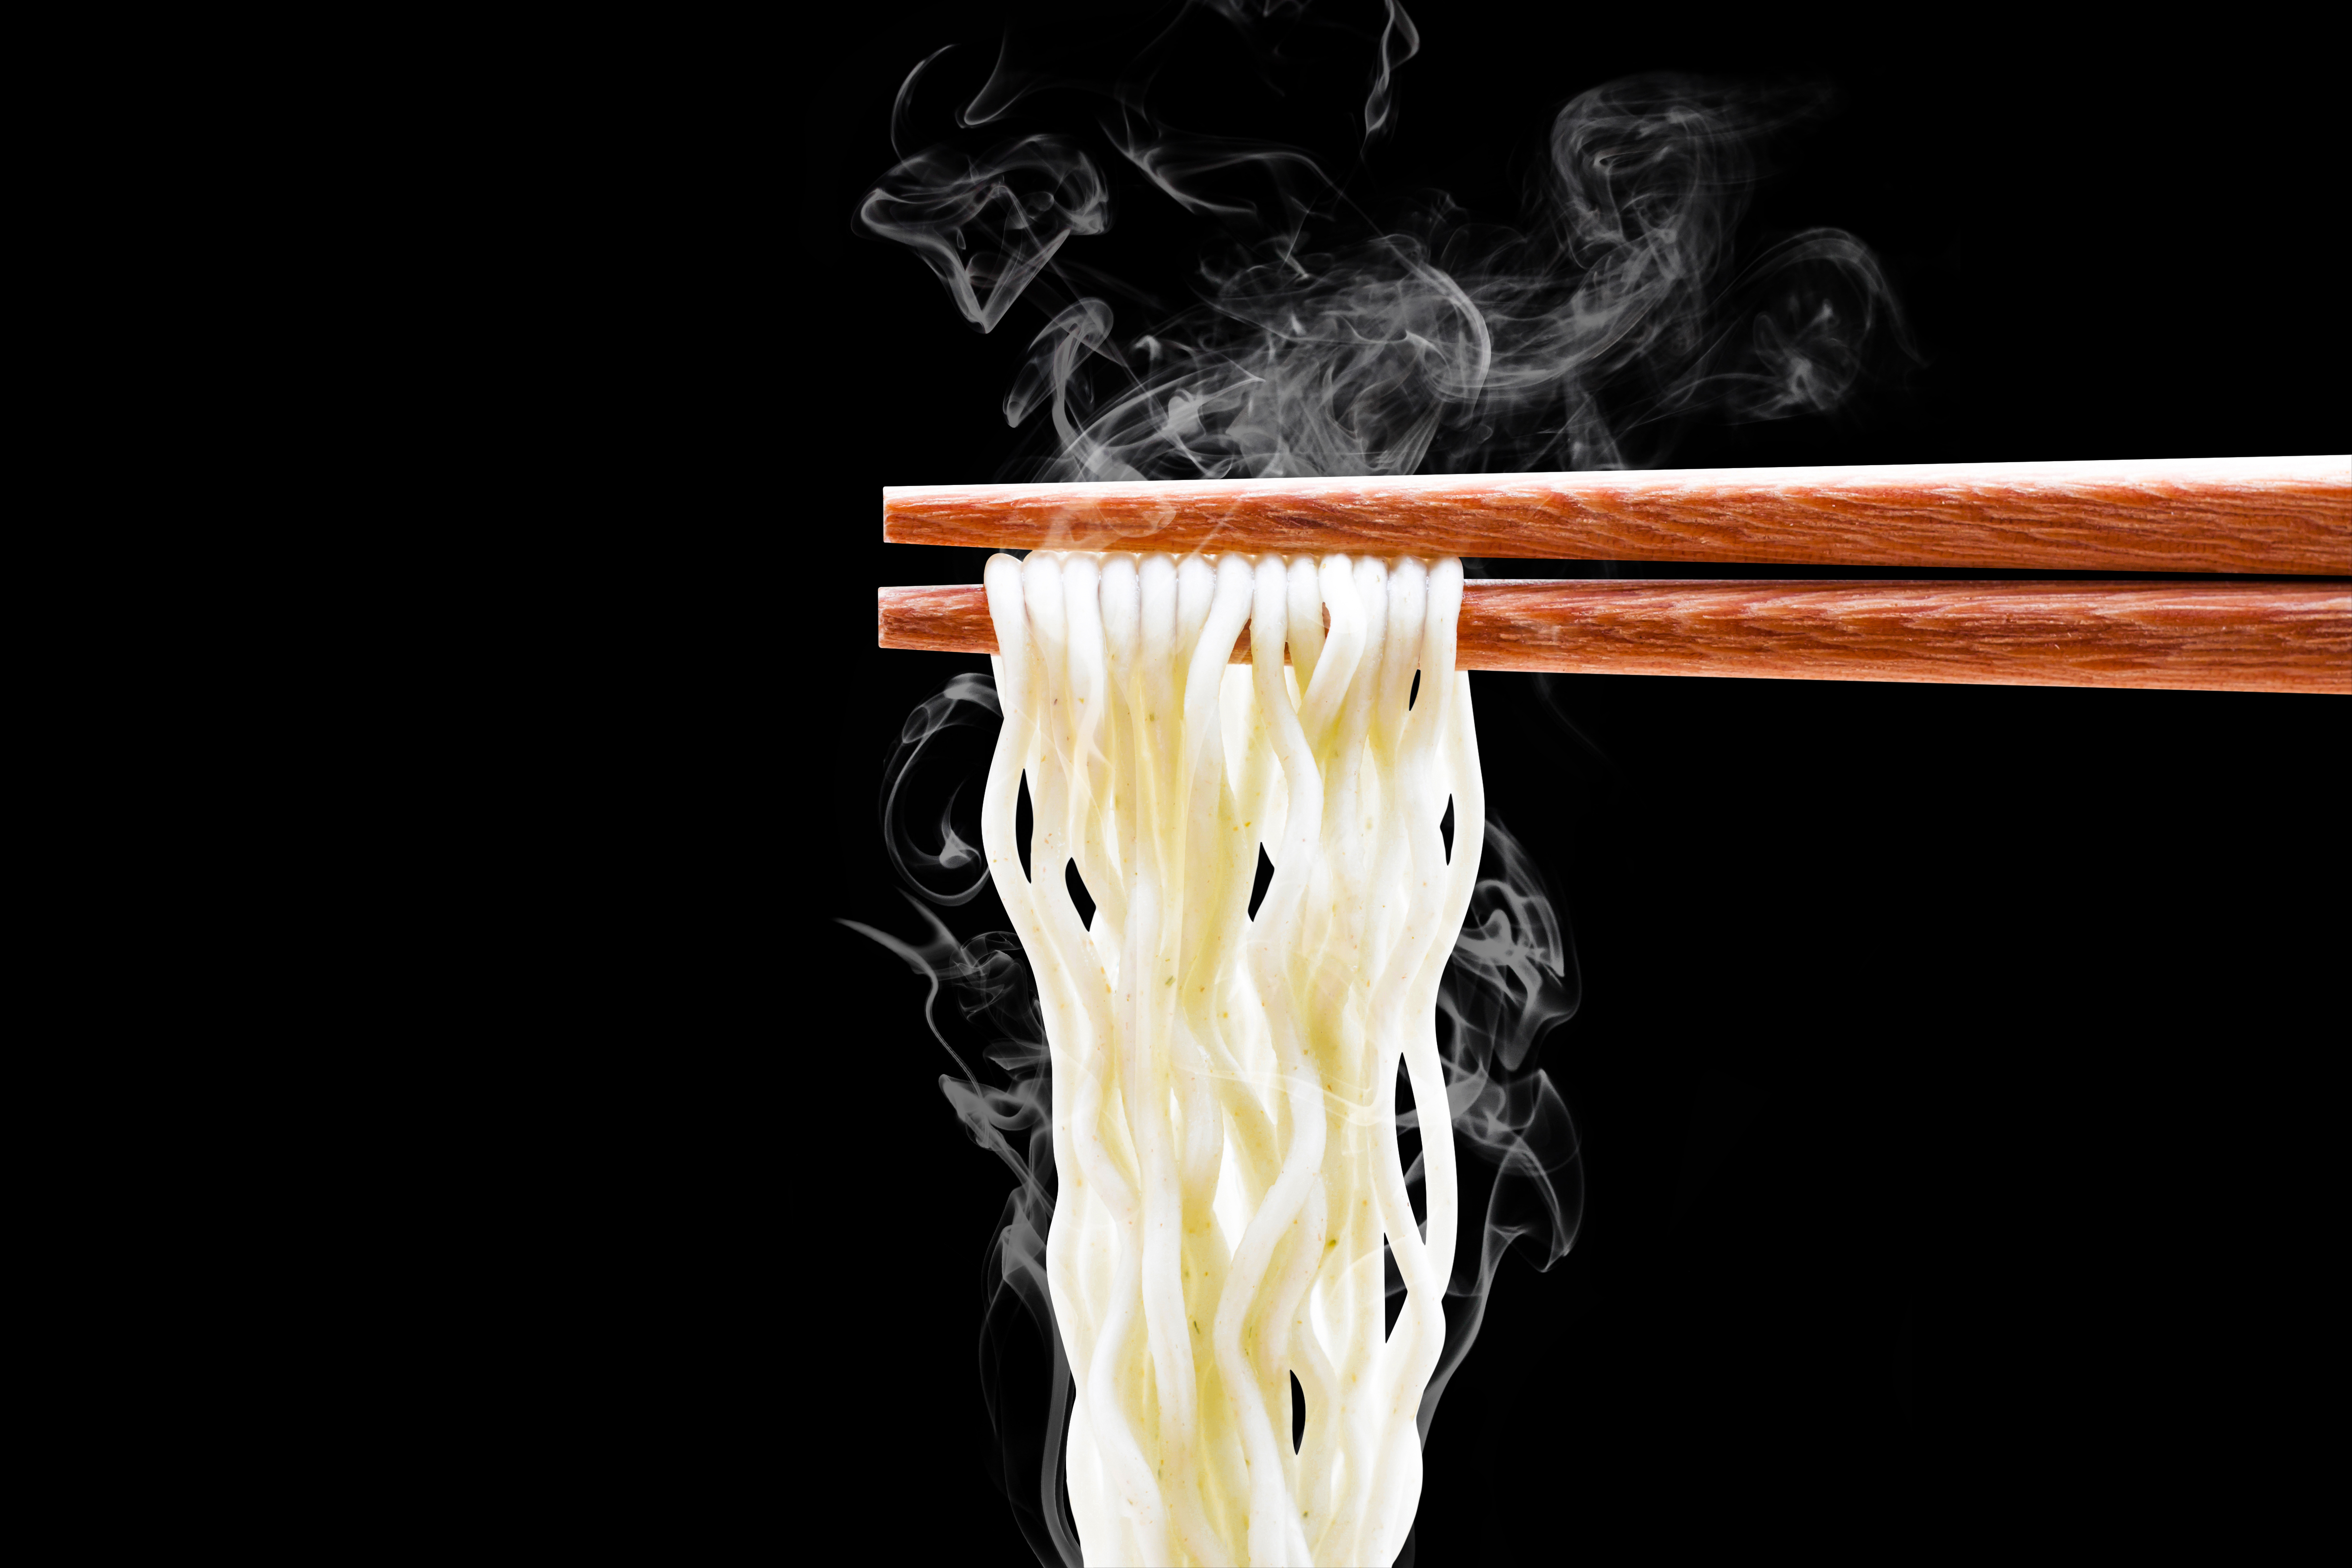 Ramen noodles held up by chopsticks against a black background